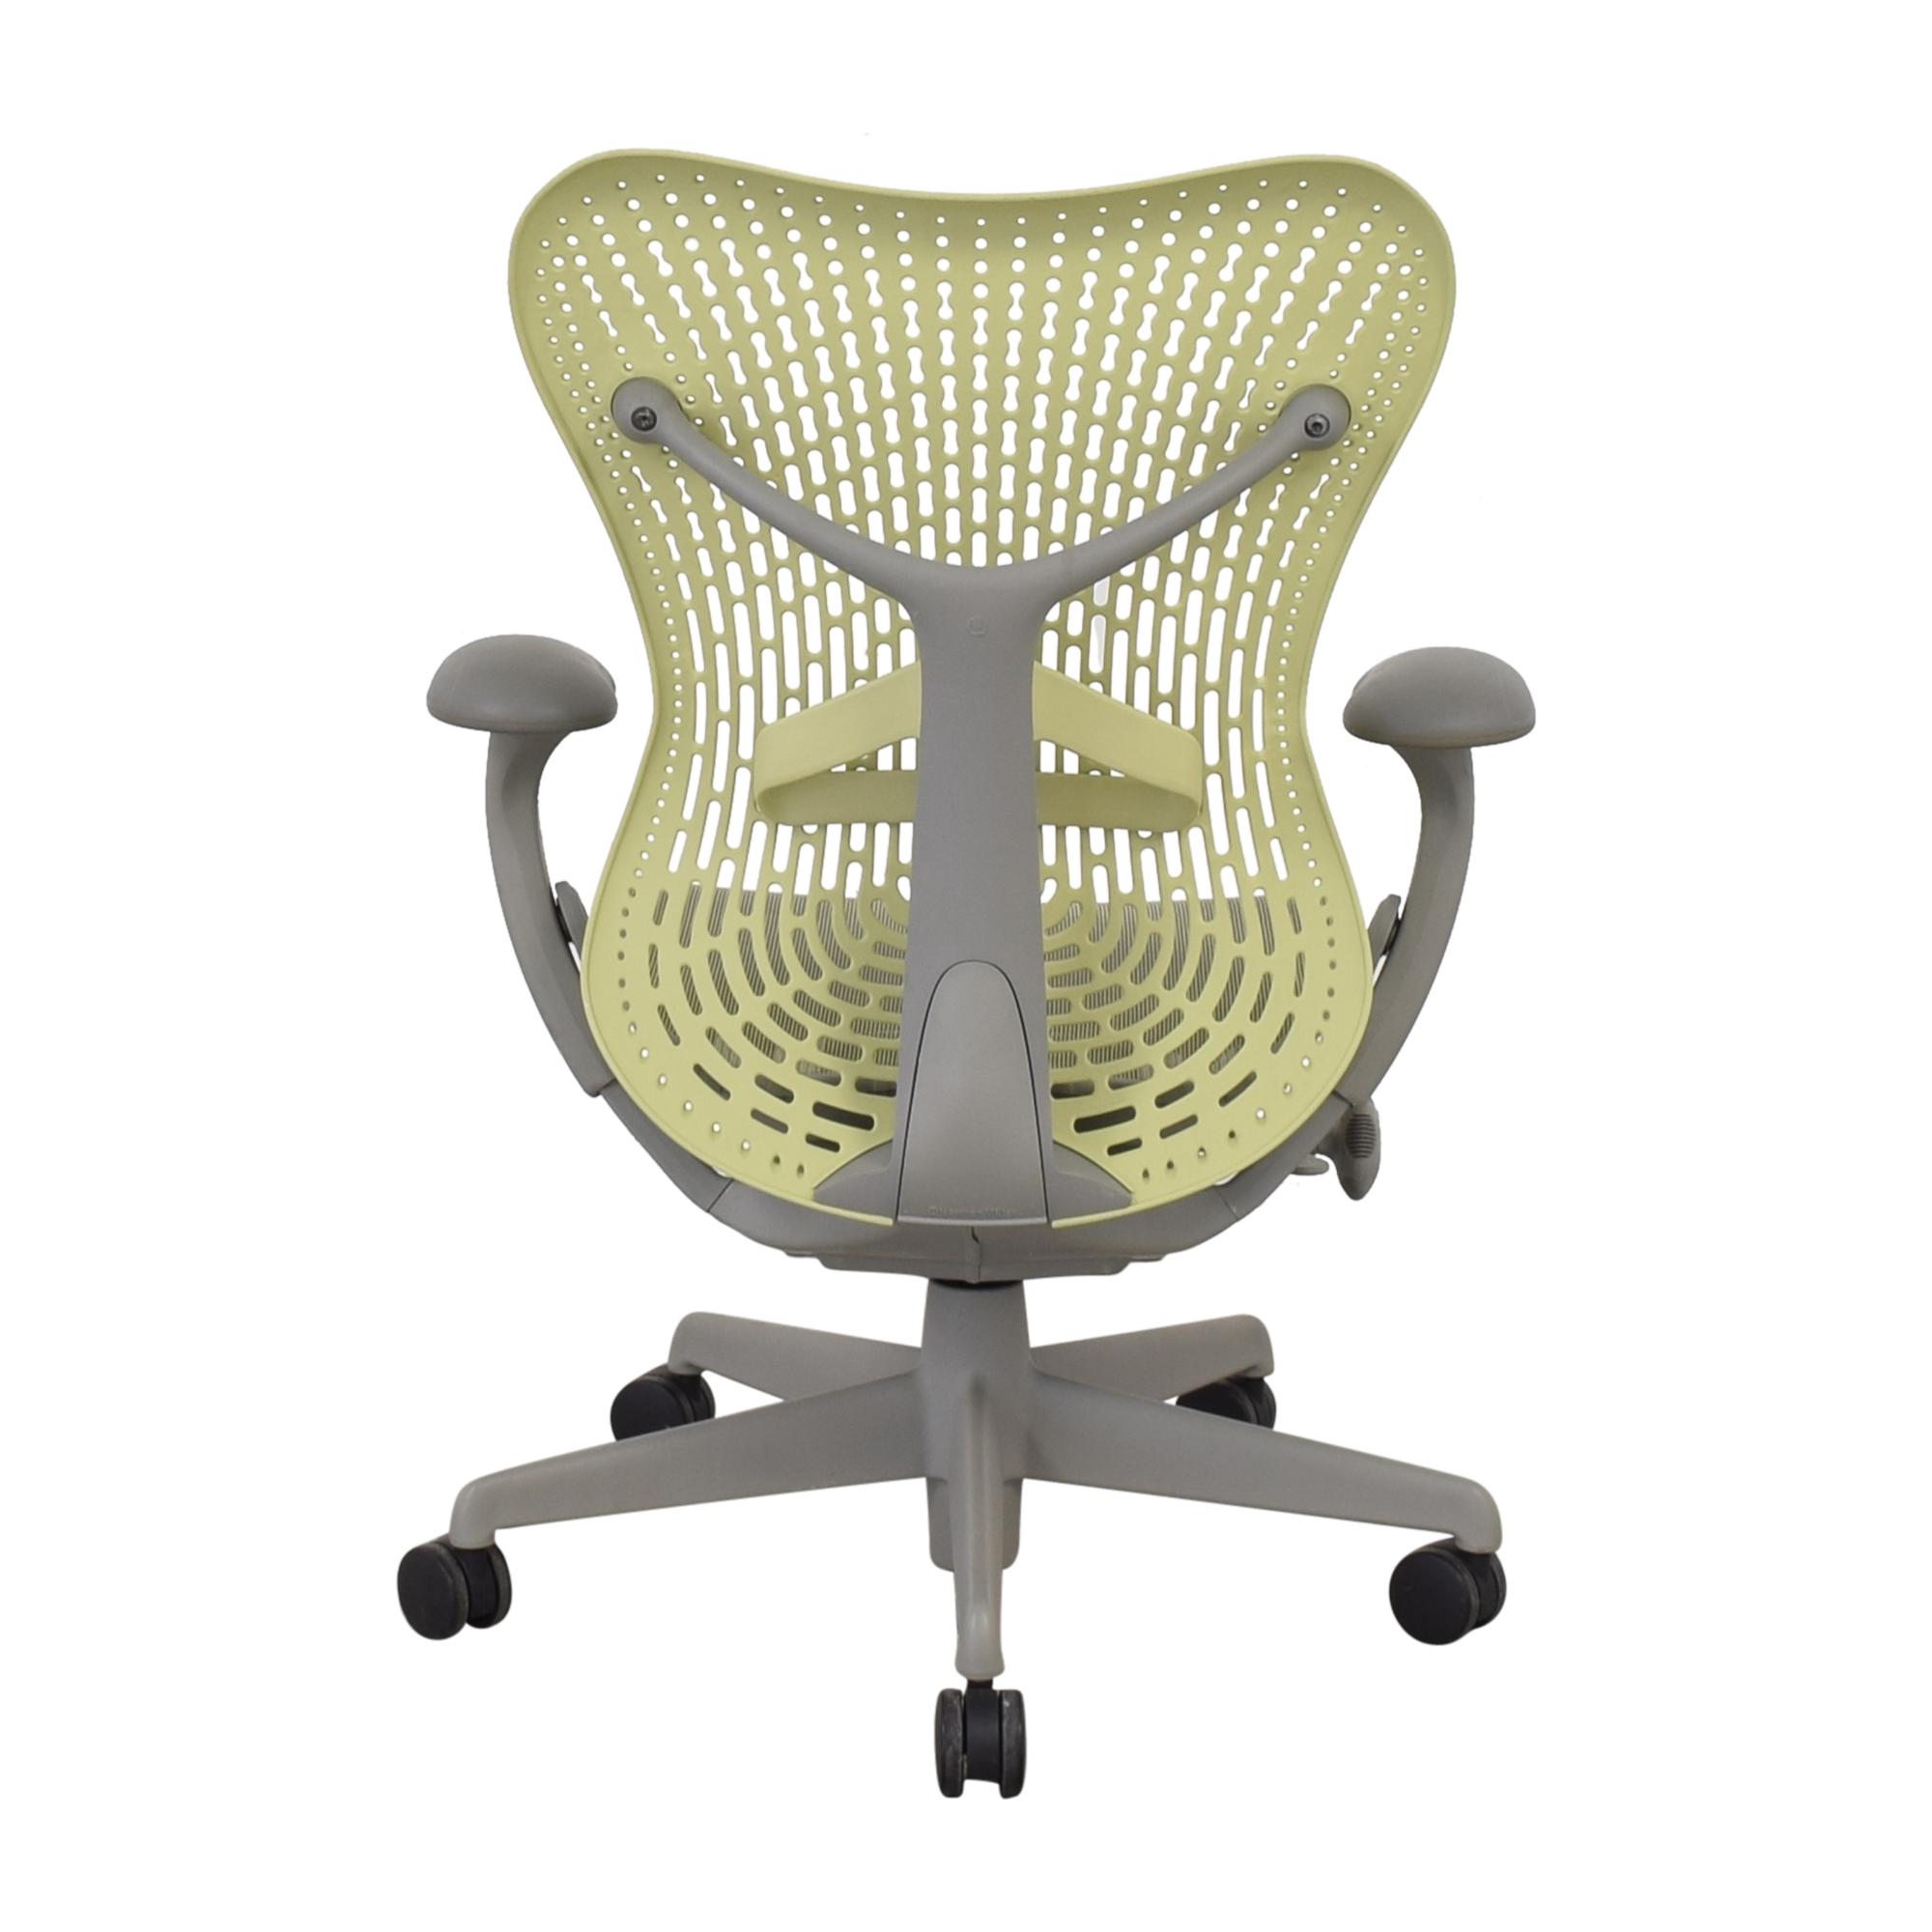 Herman Miller Herman Miller Mirra Chair second hand